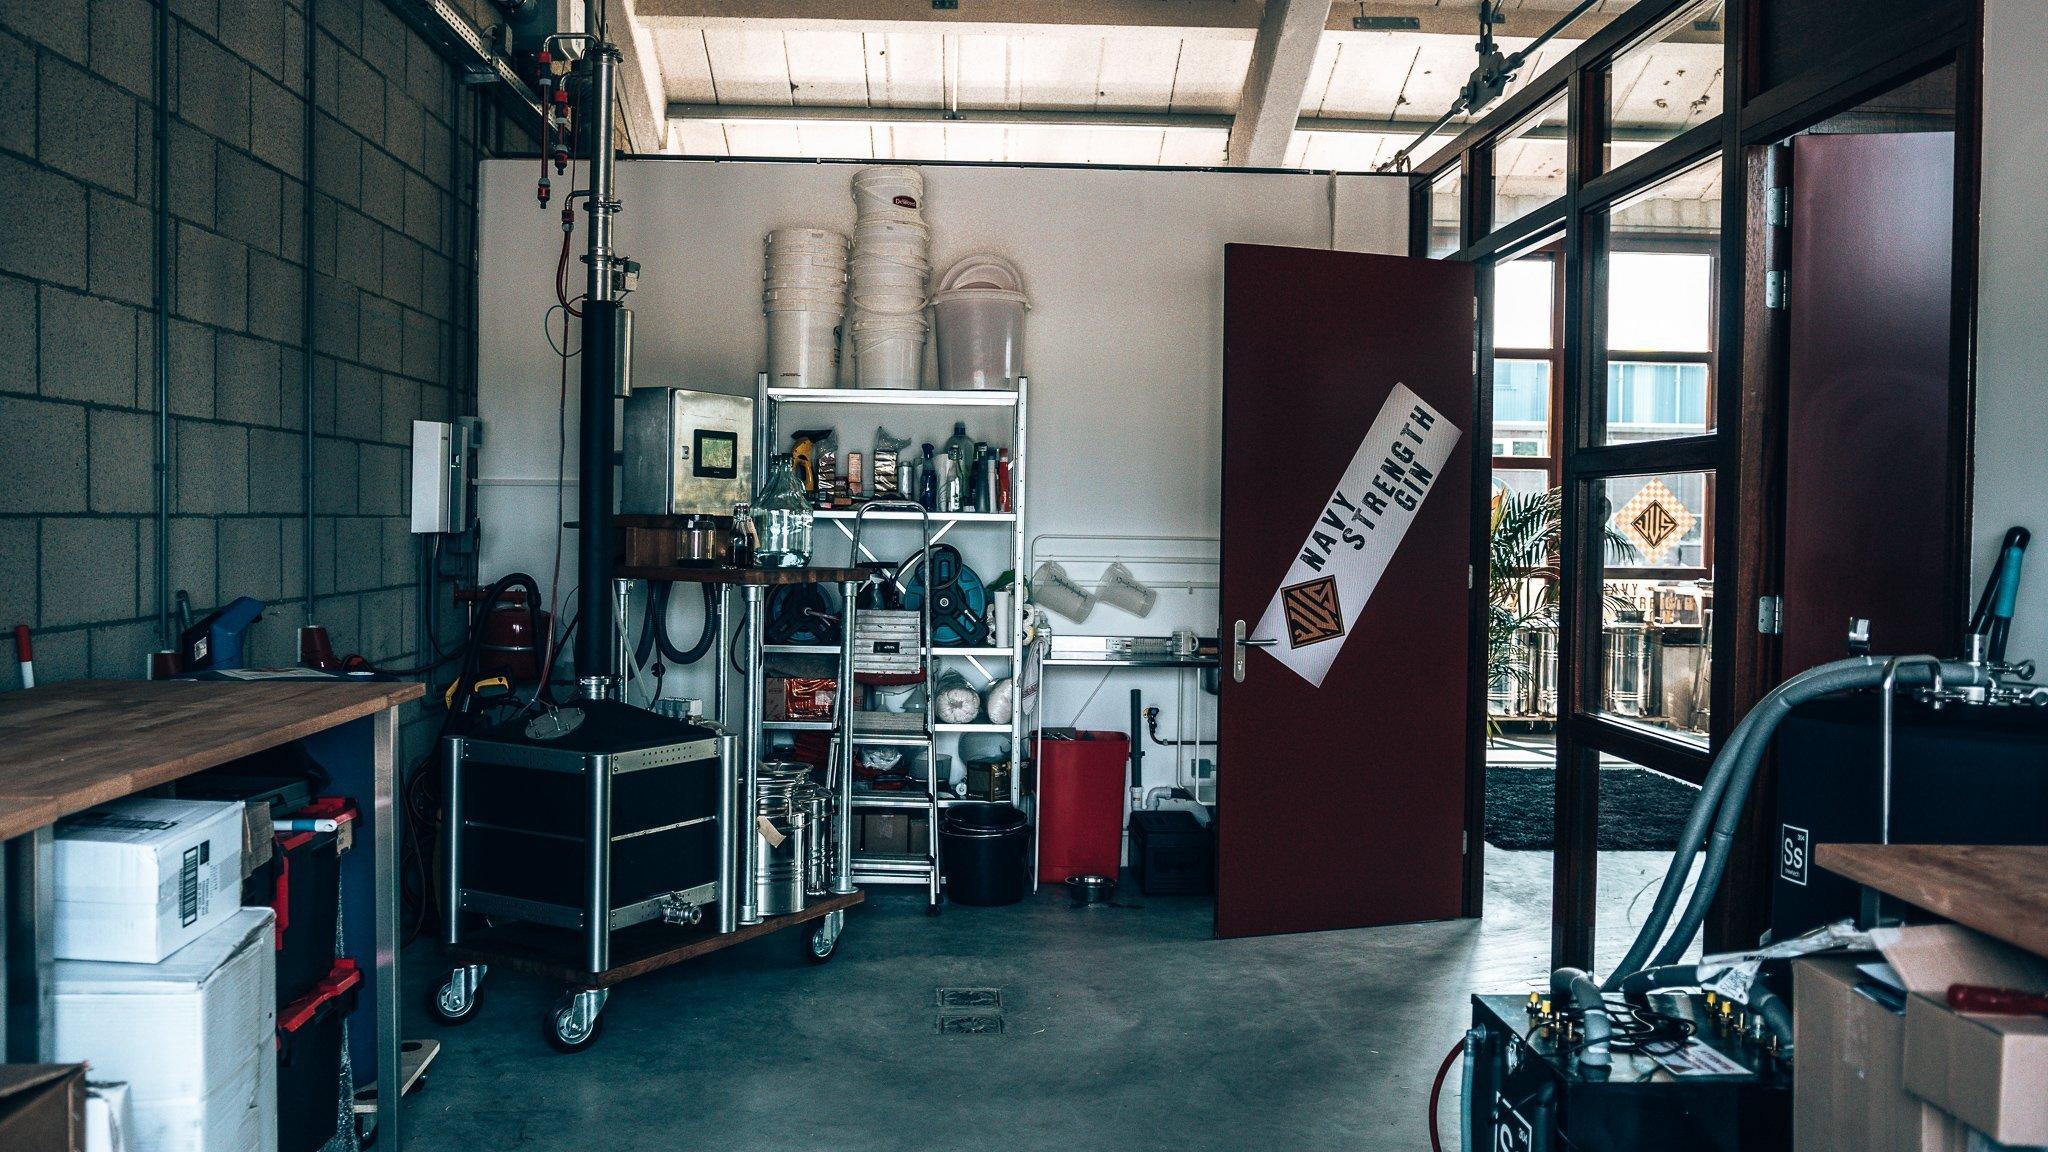 Distilleerketel van Driftwood Distillery, Vliegkamp Valkenburg, Alles over gin.